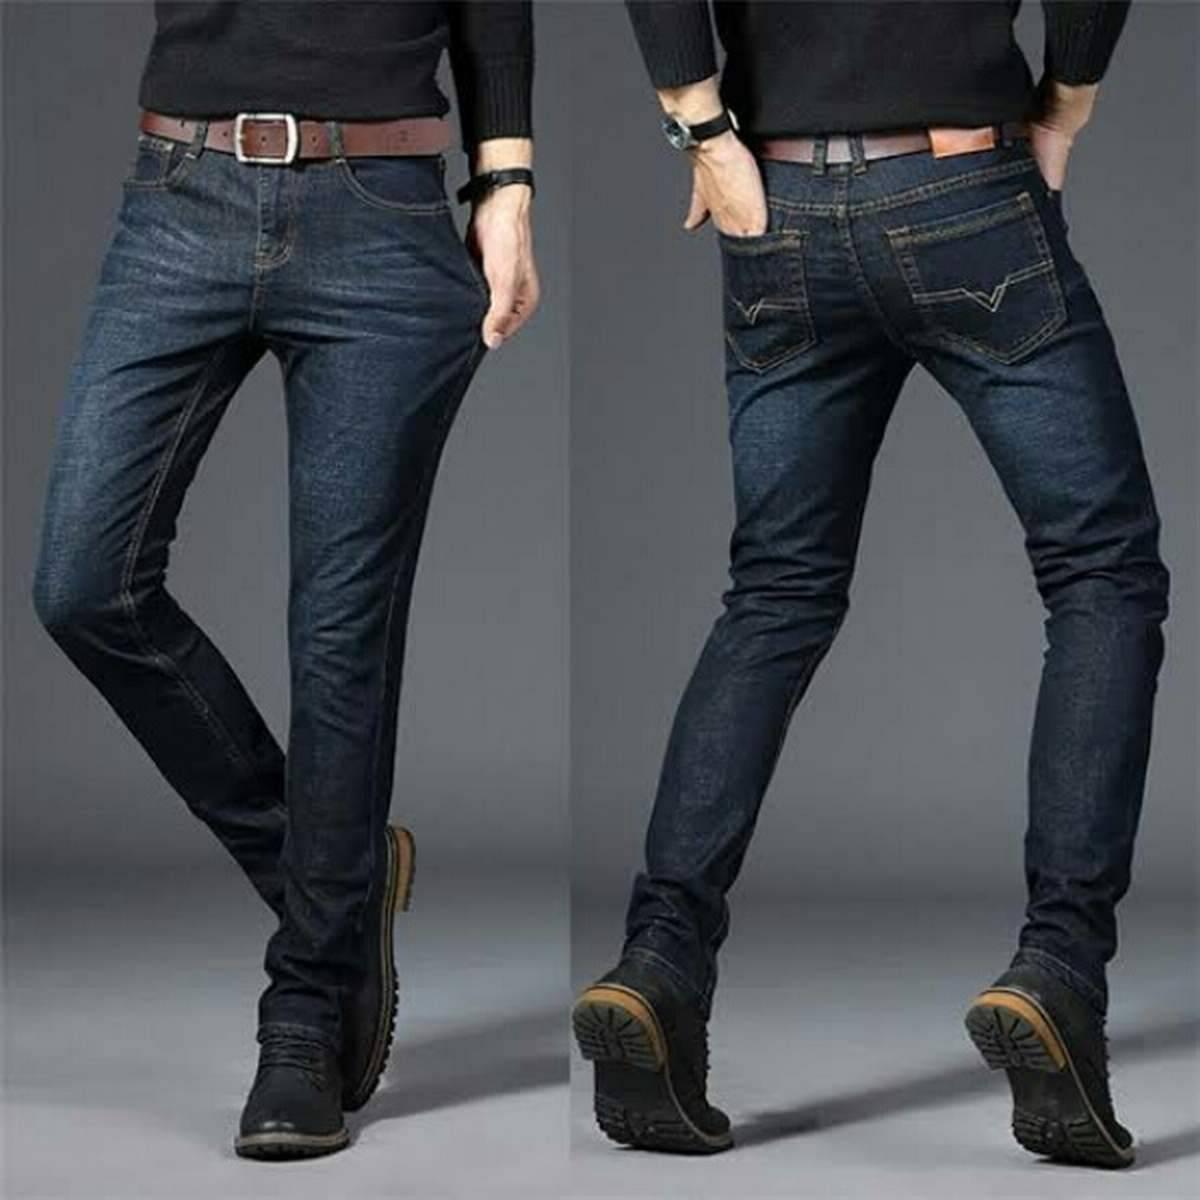 One Black Plain Jeans For Men Ukcollection